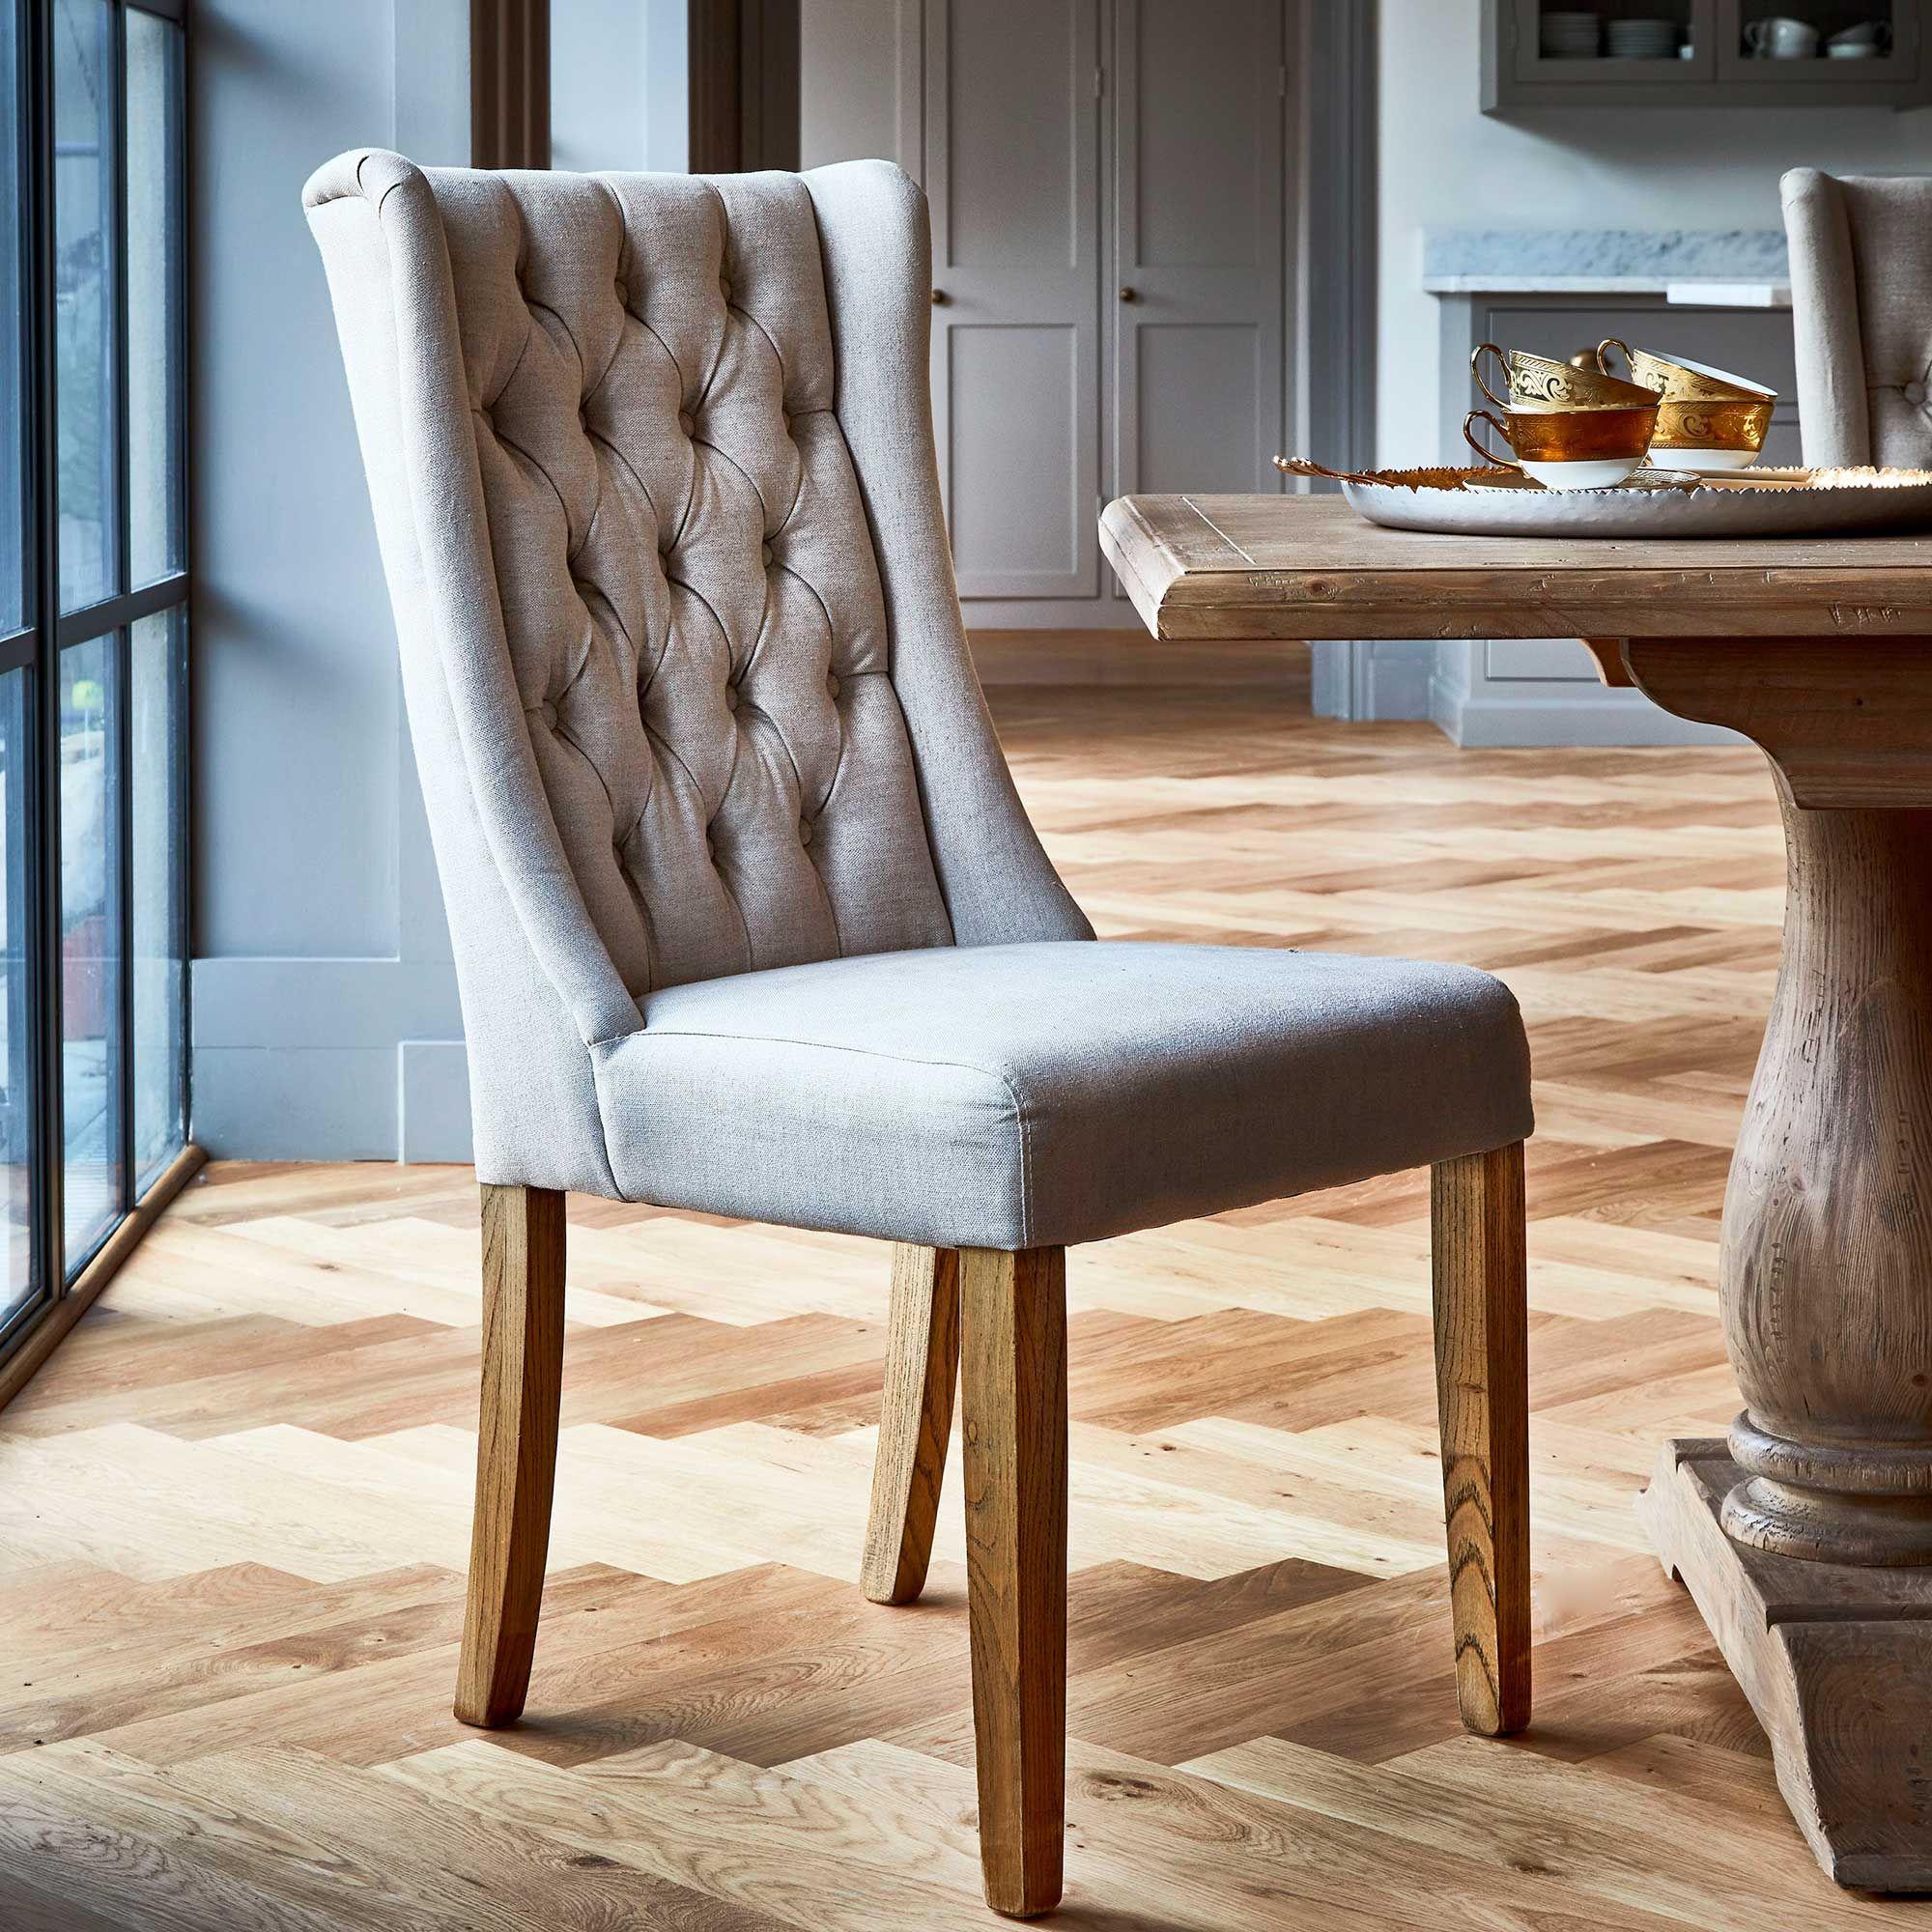 Kipling Fabric Dining Chair, Cream & Oak - Barker & Stonehouse images